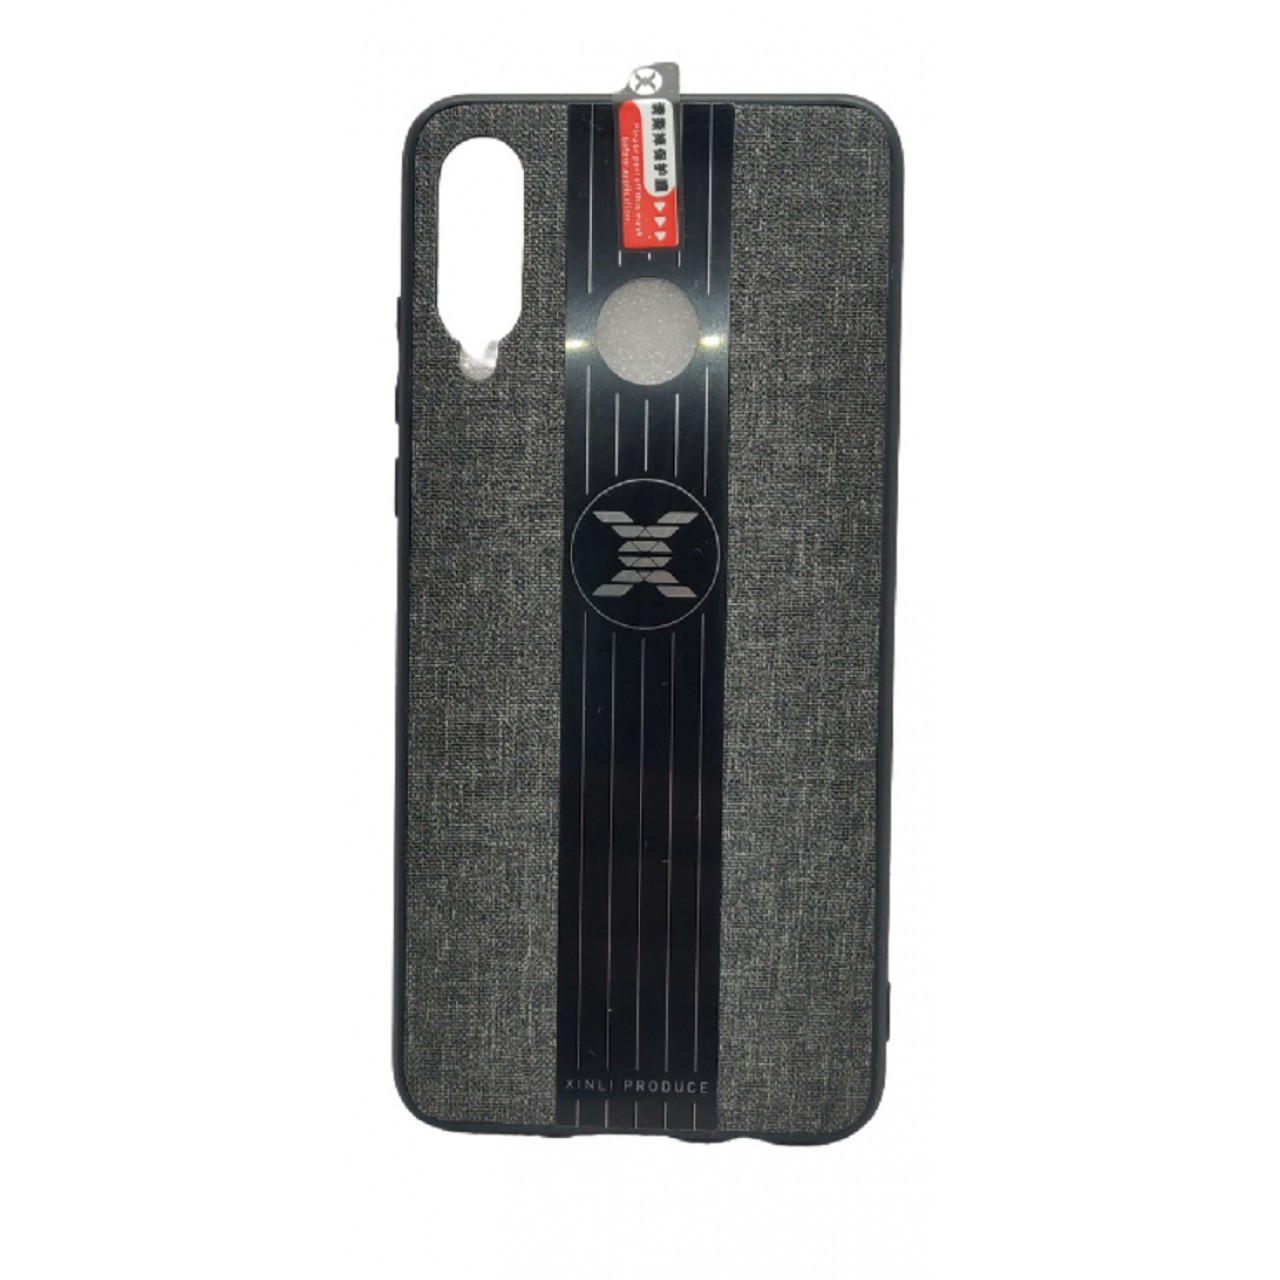 Back Case Cloth Pattern with ring for Huawei P30 Lite Grey - Θήκη προστασίας με δαχτυλίδι στην πλάτη Γκρι - OEM